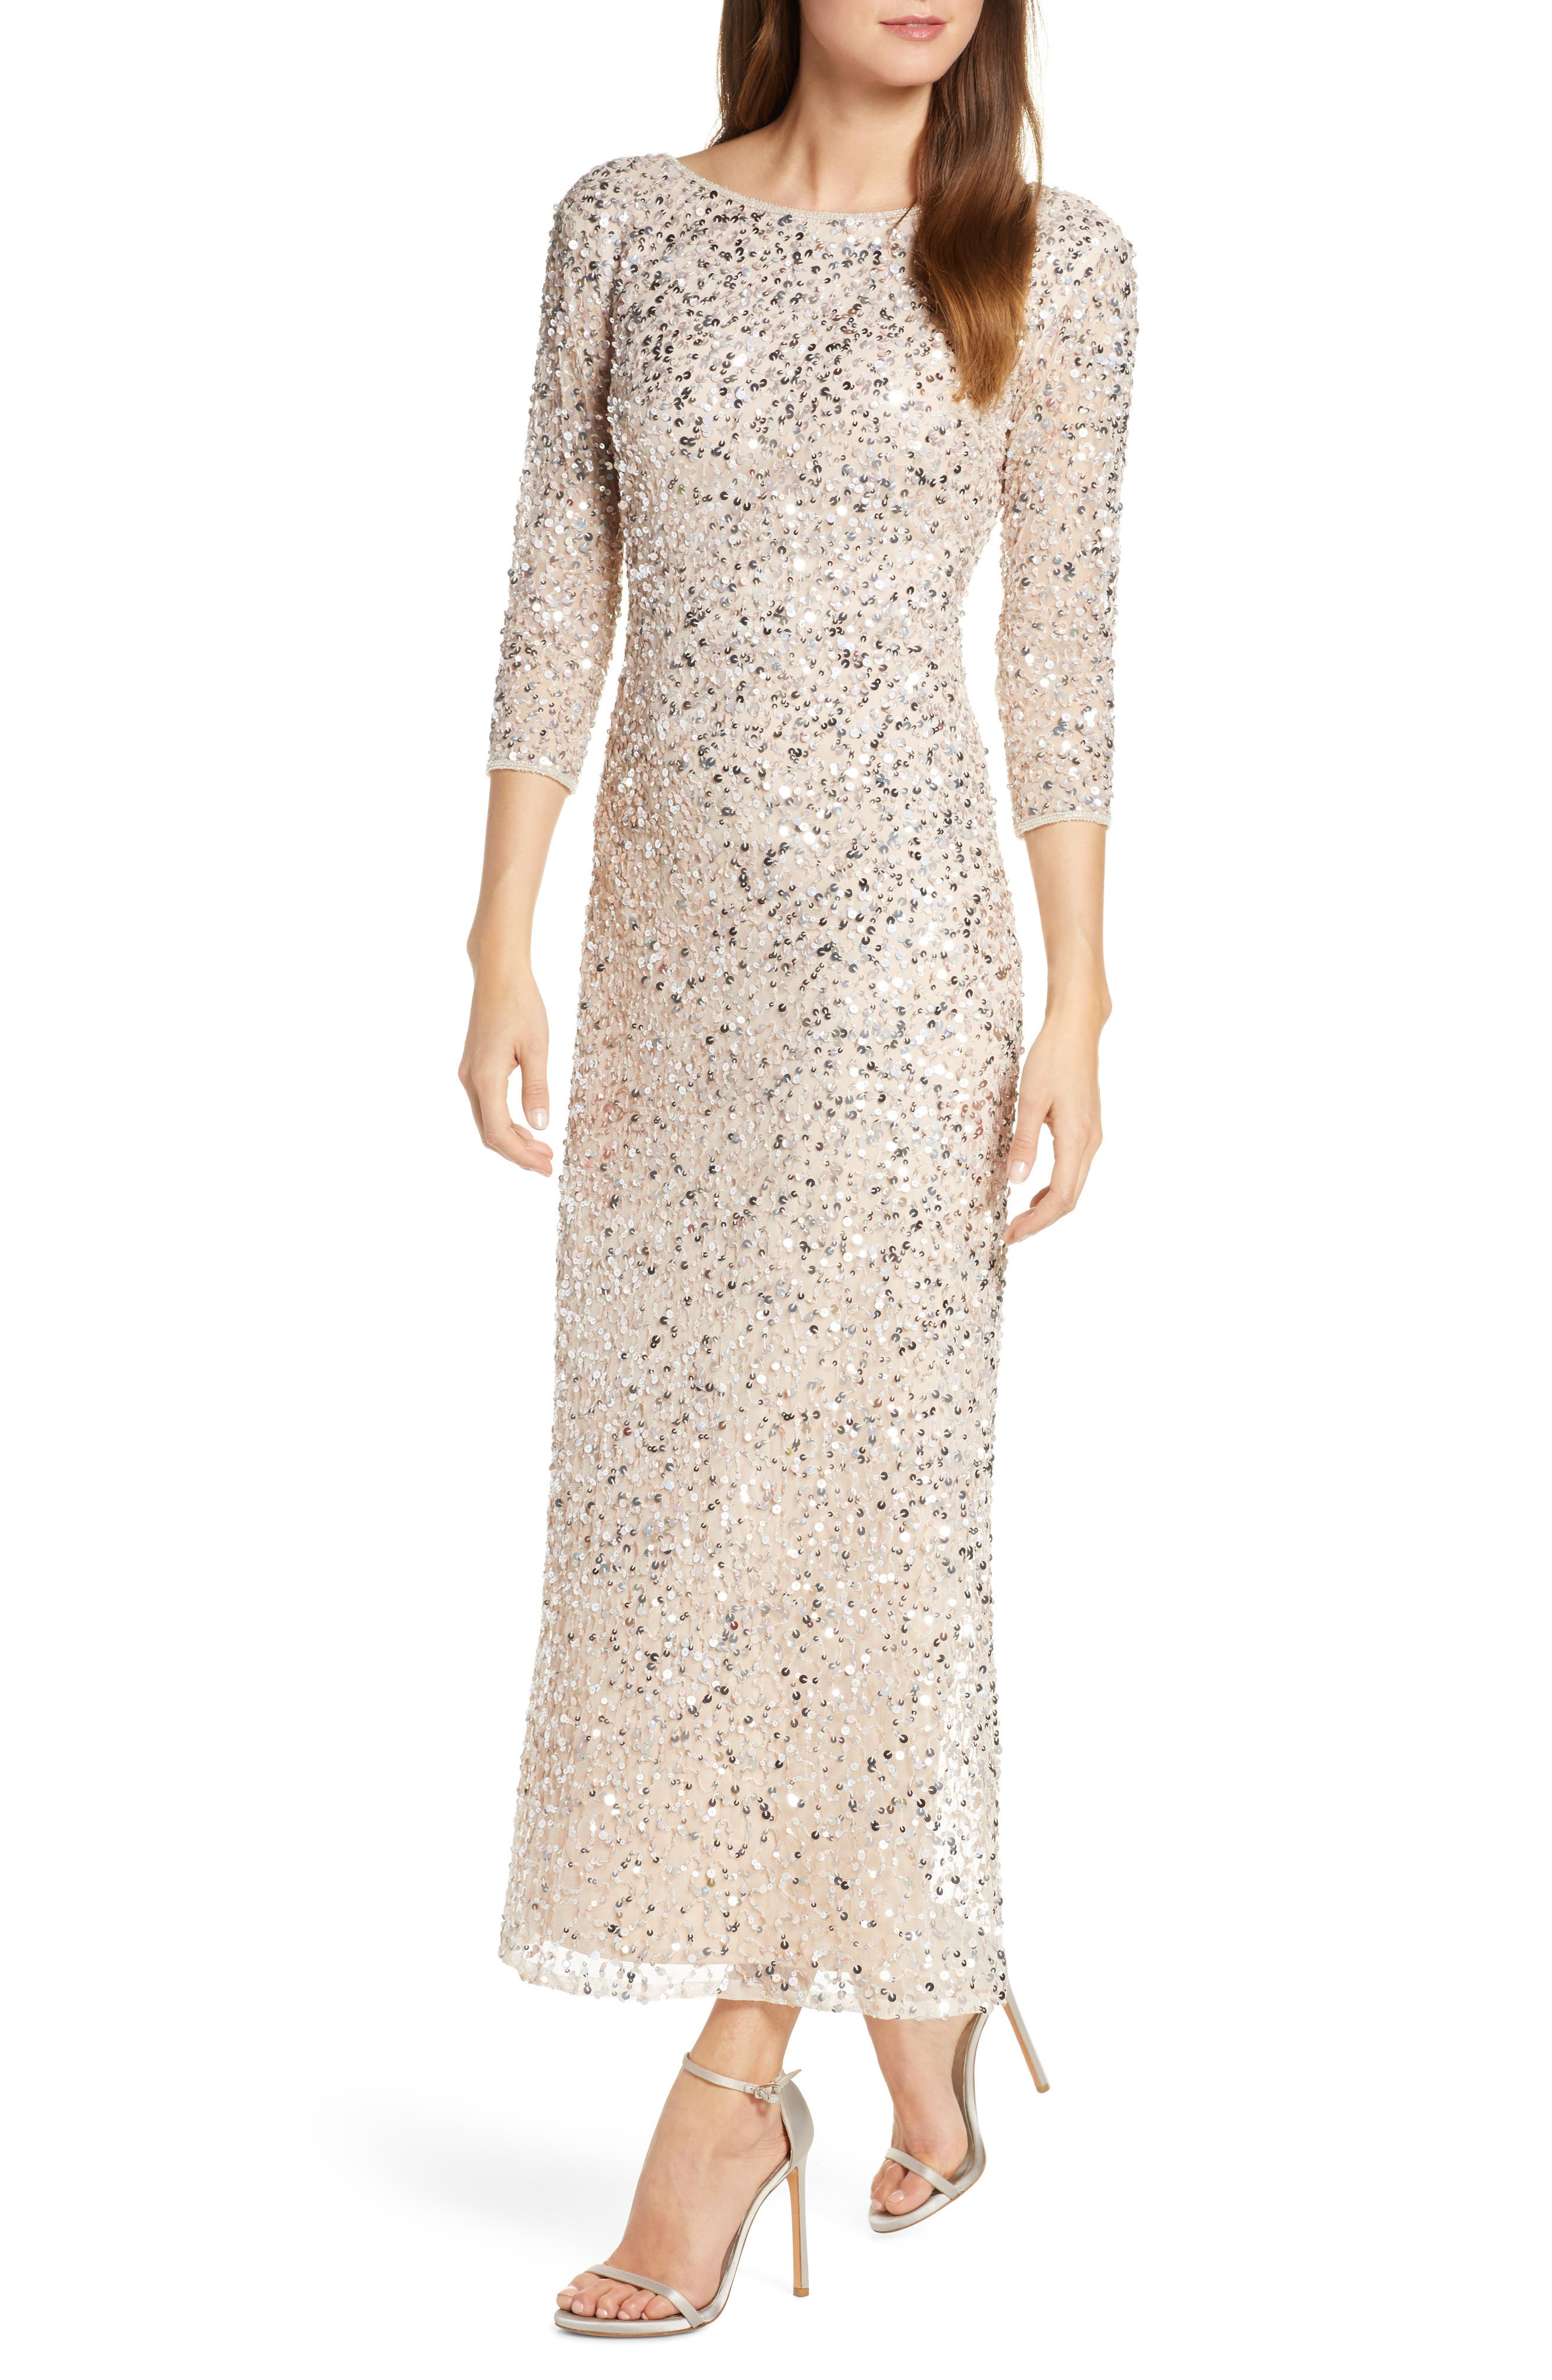 60s Wedding Dresses | 70s Wedding Dresses Womens Pisarro Nights Sequin Mesh Gown $248.00 AT vintagedancer.com